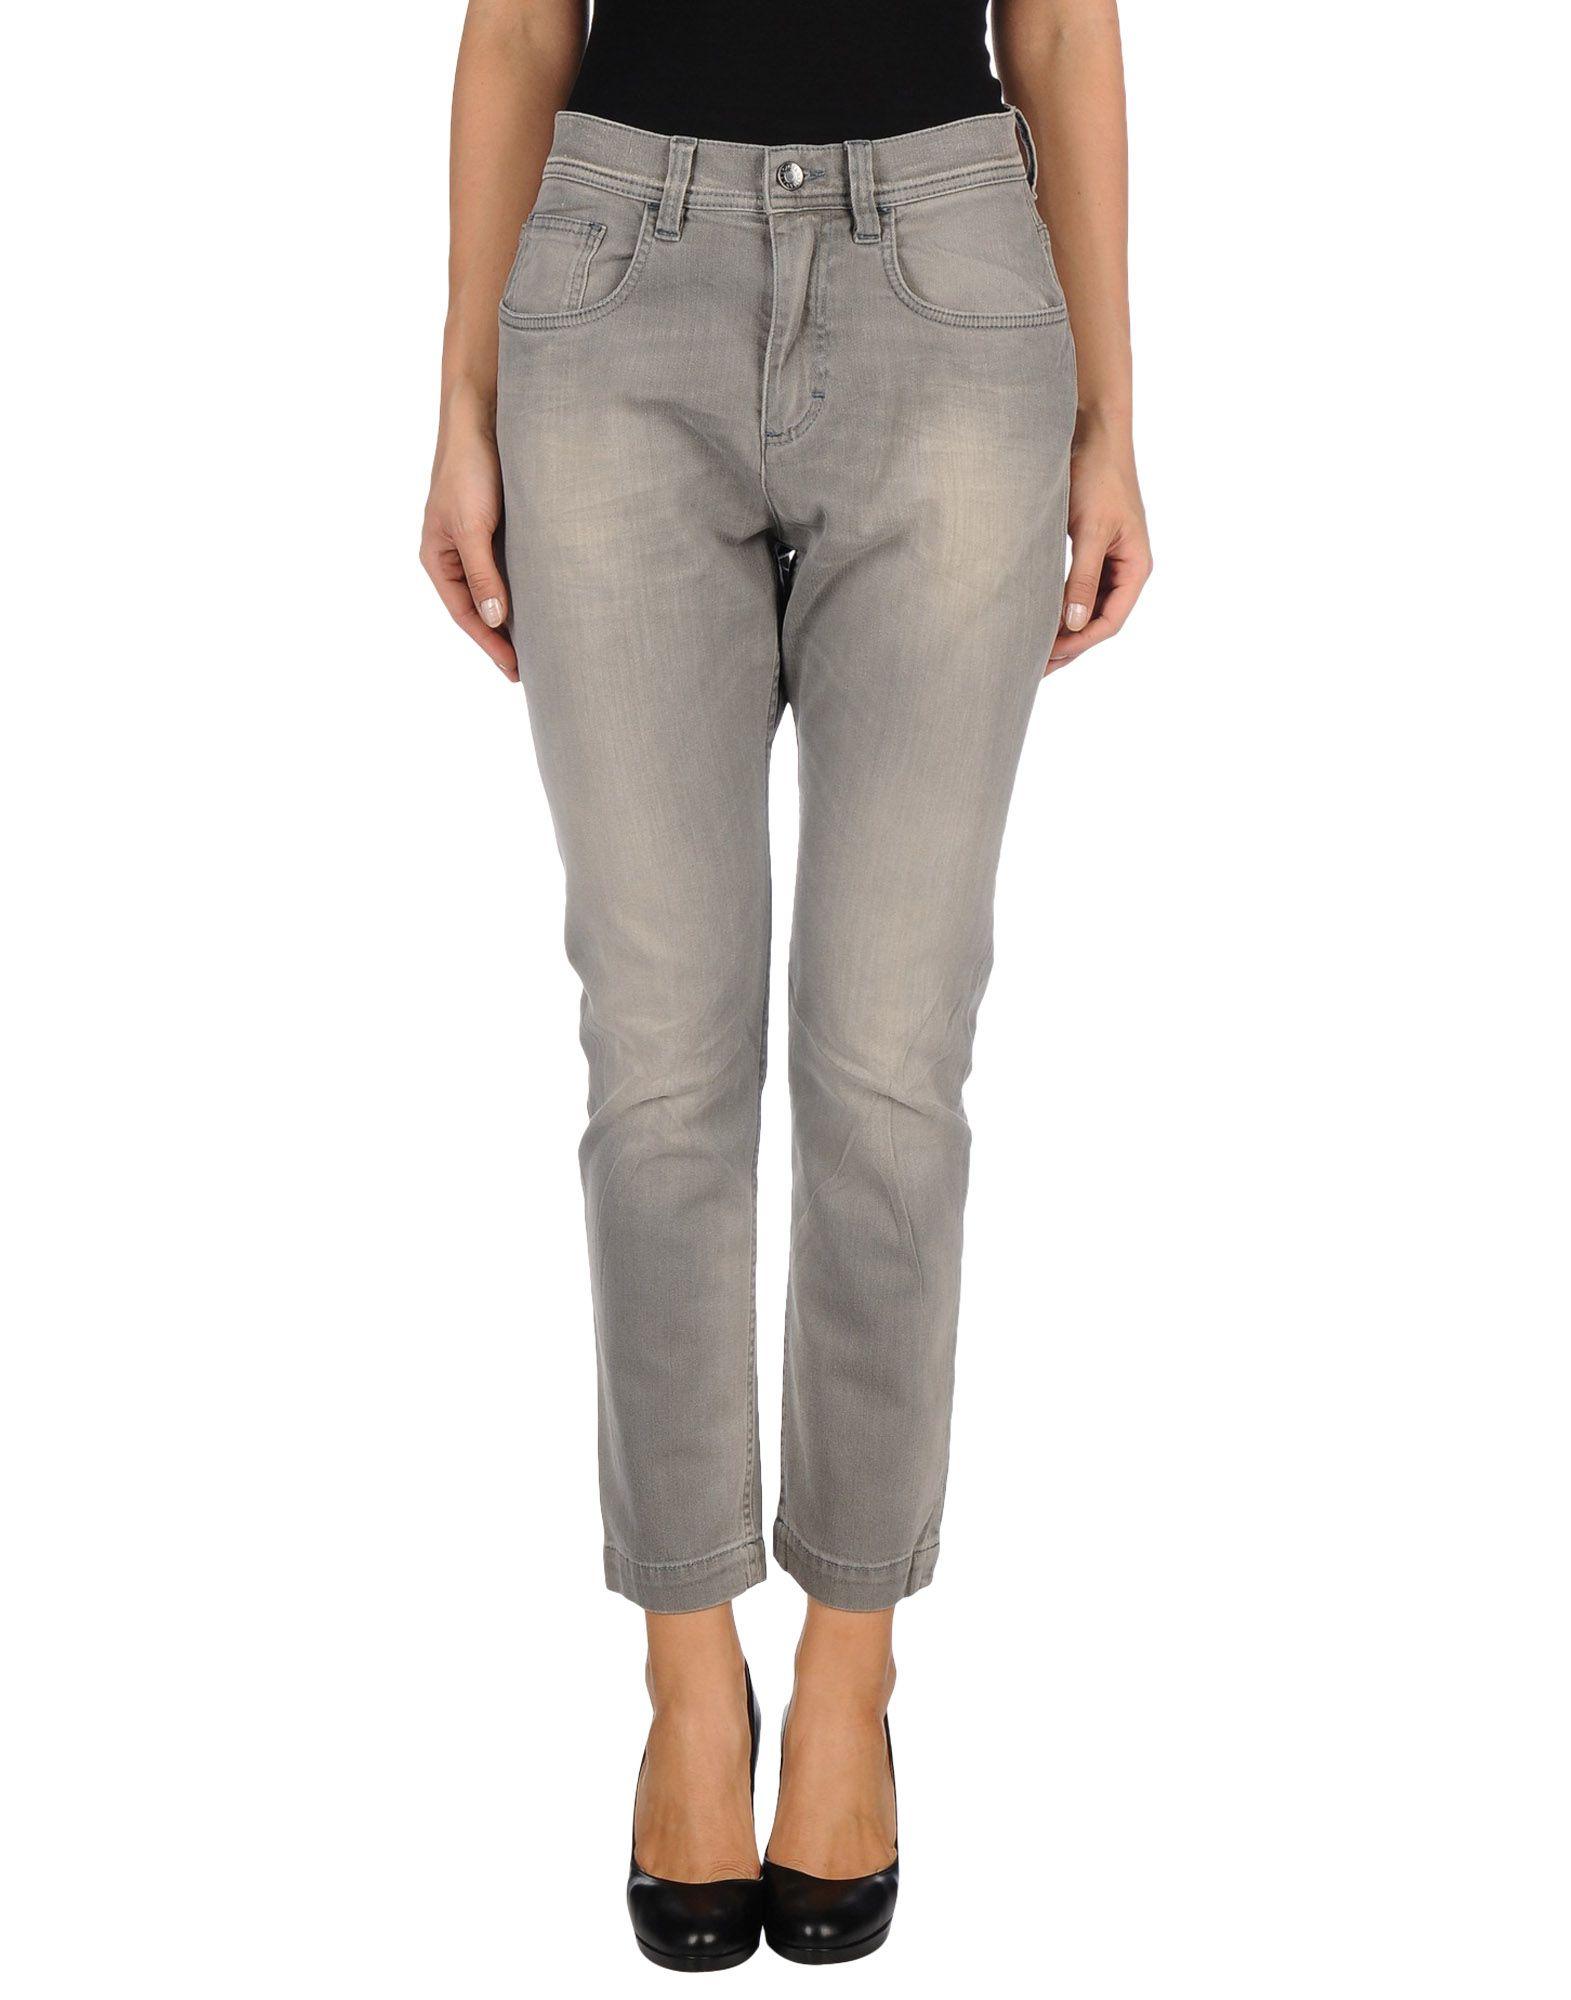 dolce gabbana denim pants in gray lyst. Black Bedroom Furniture Sets. Home Design Ideas